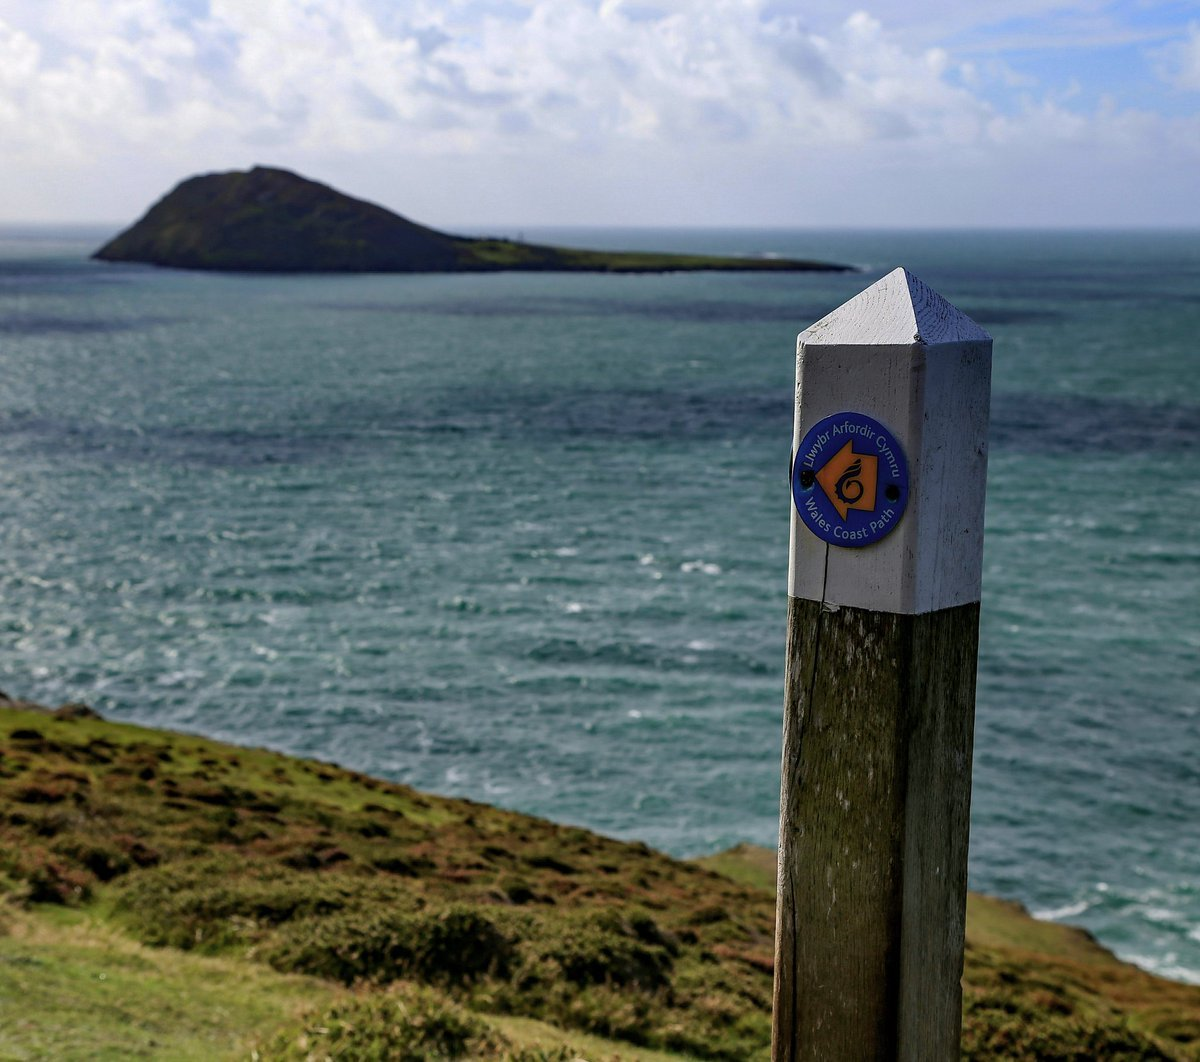 Wales Coast Path walking guidebooks